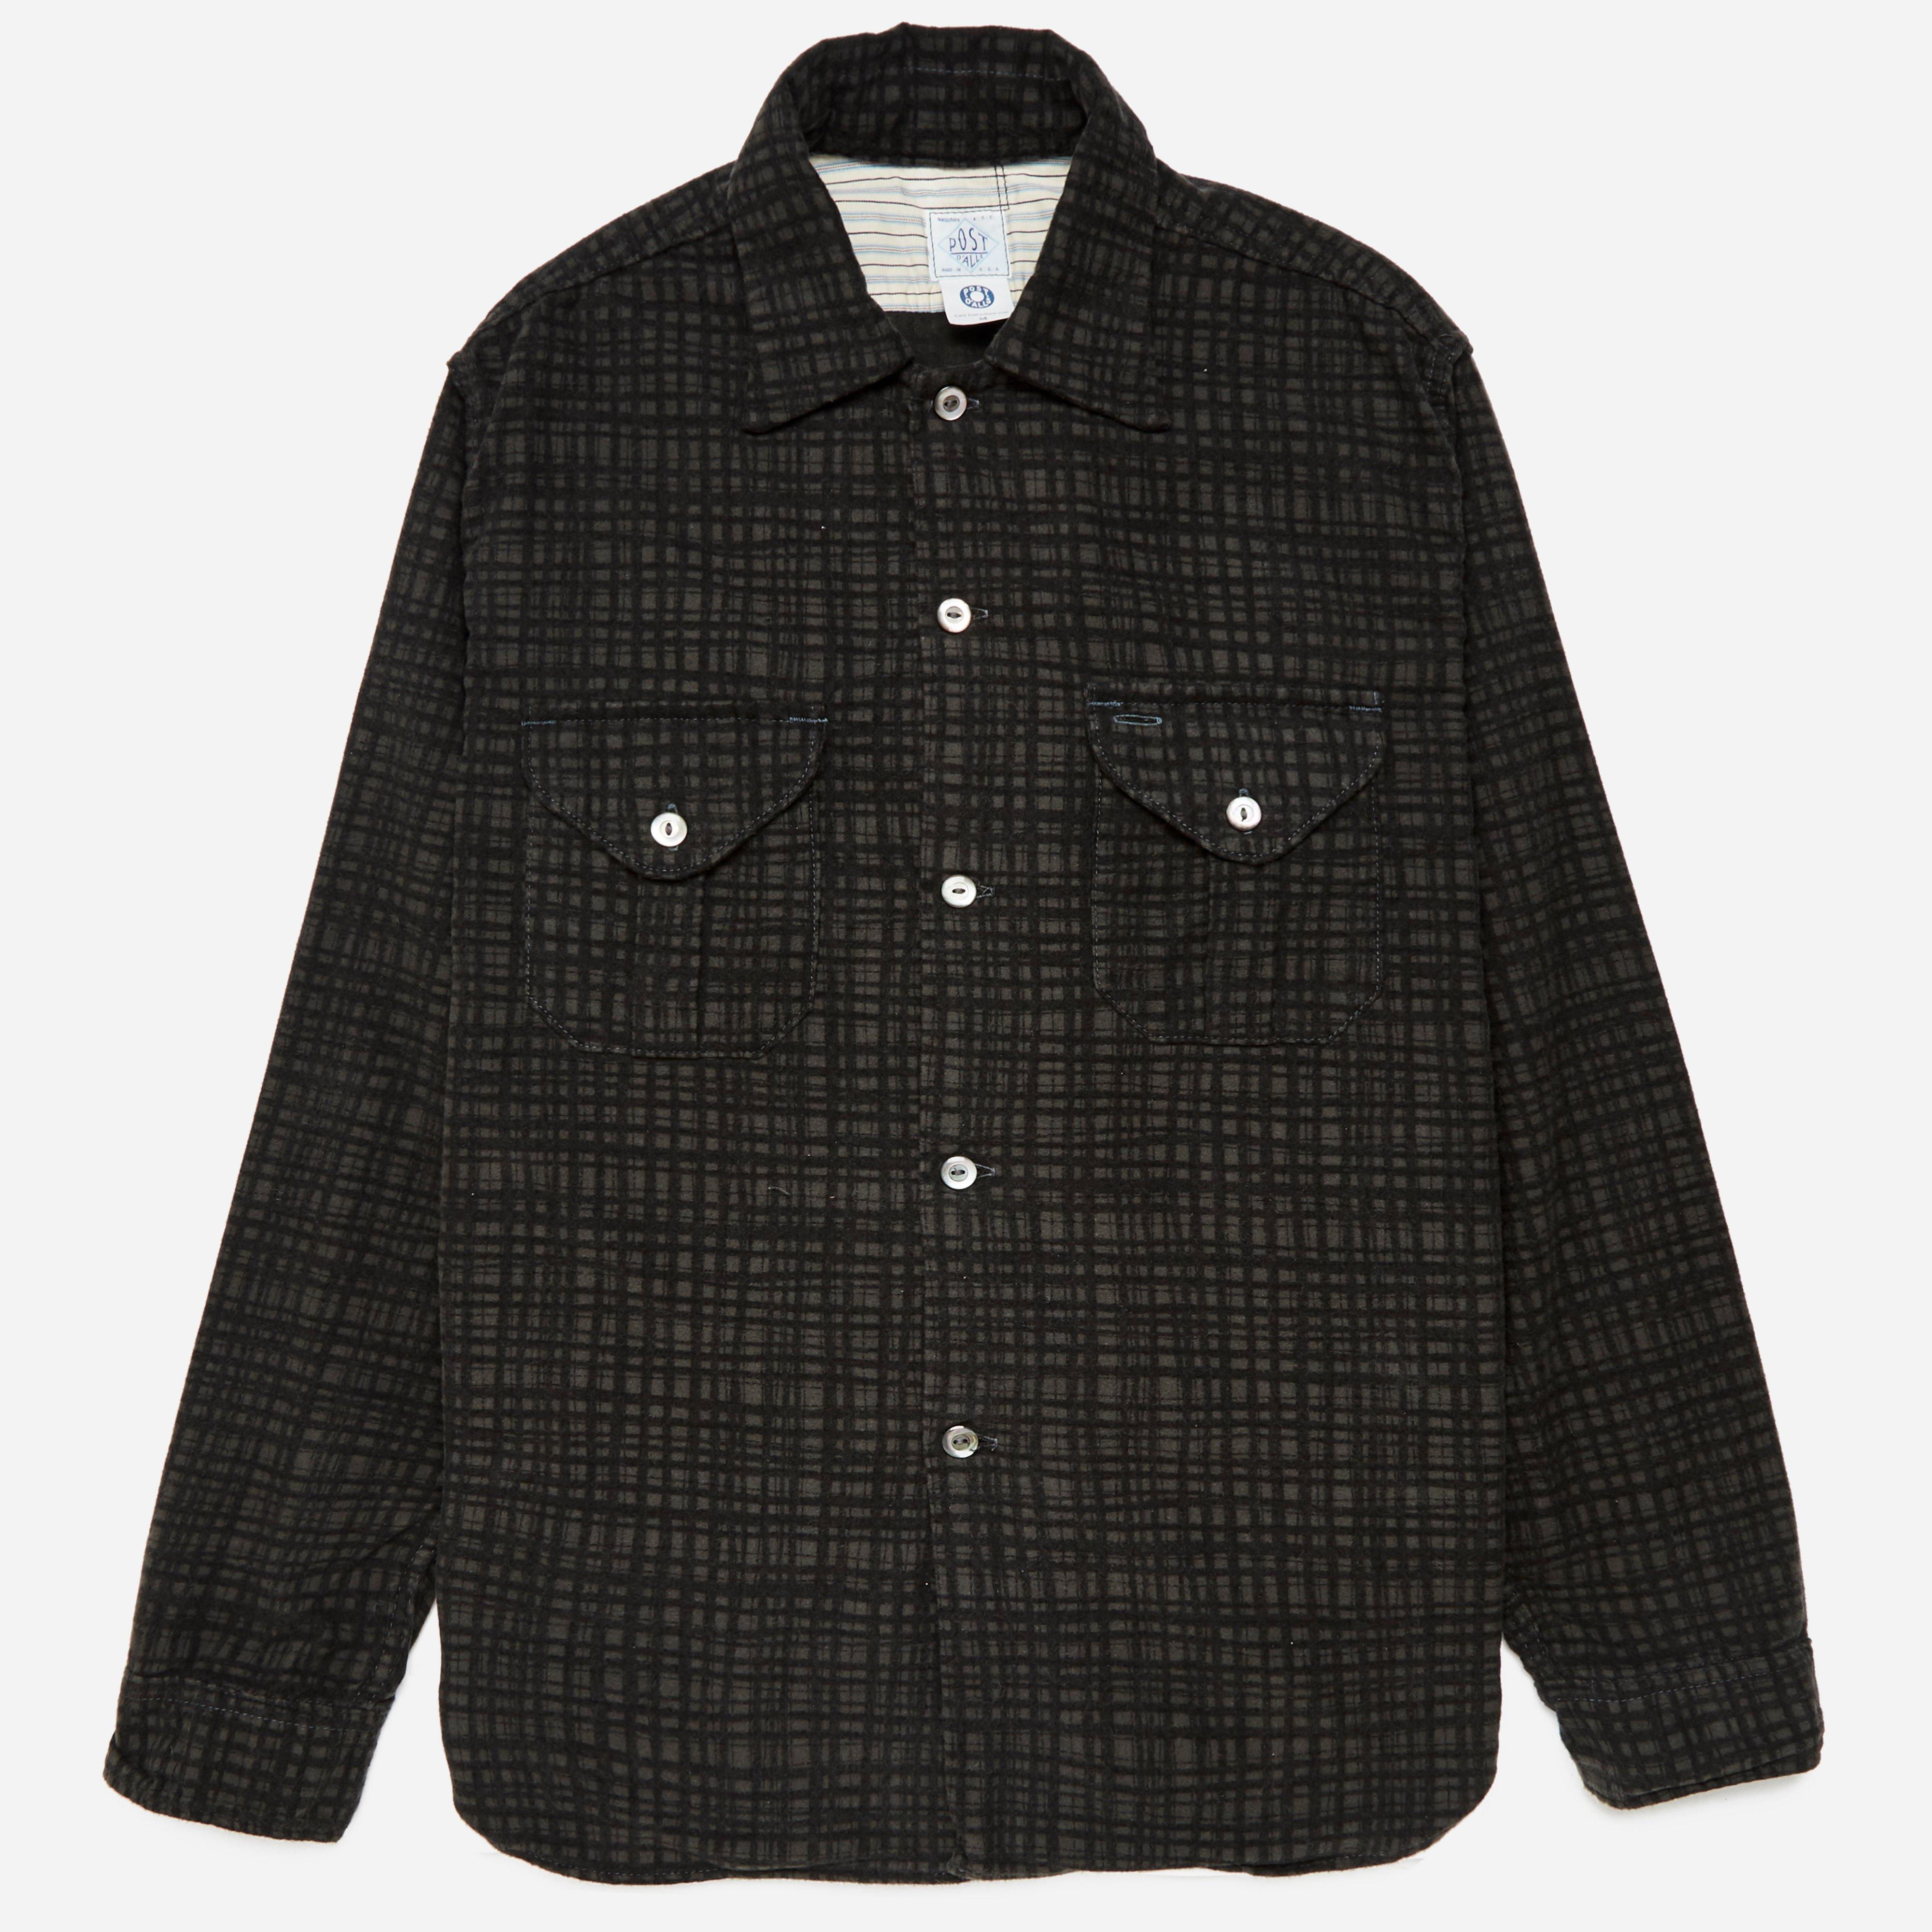 Post Overalls E-Z Cruz 5 Cotton Flannel Shirt